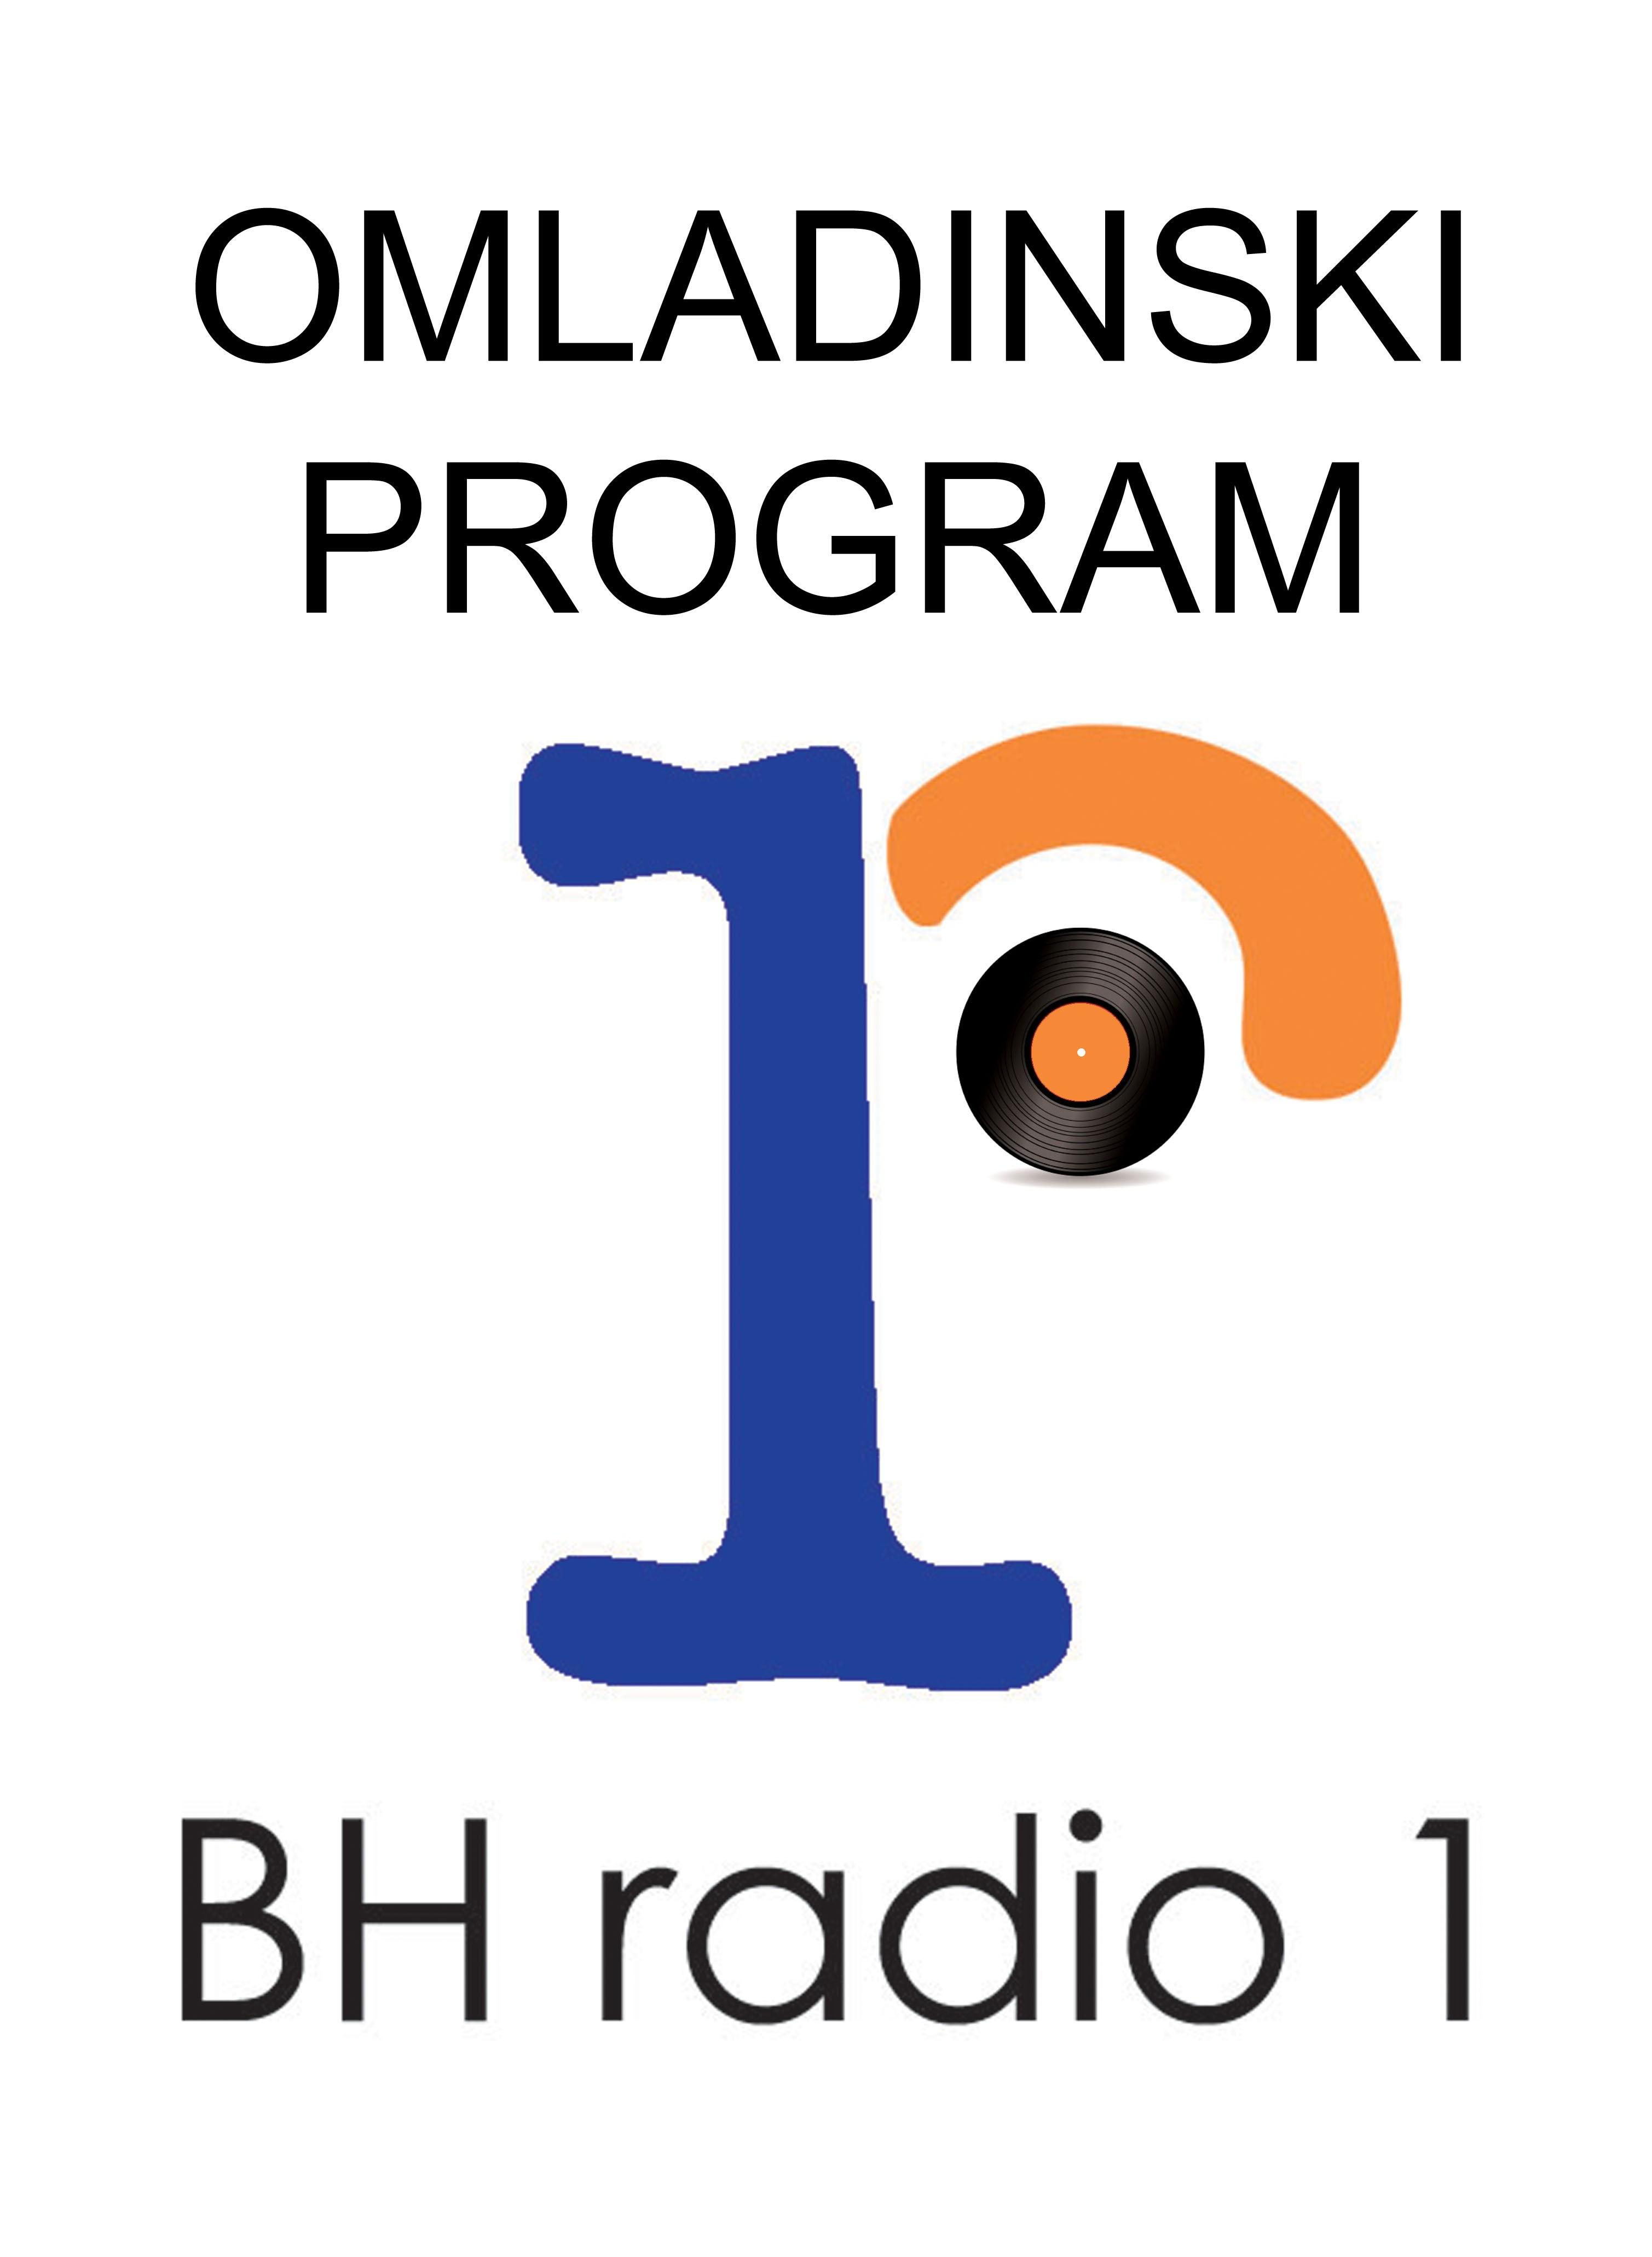 Najava za 27. avgust: Omladinski program BH radija 1